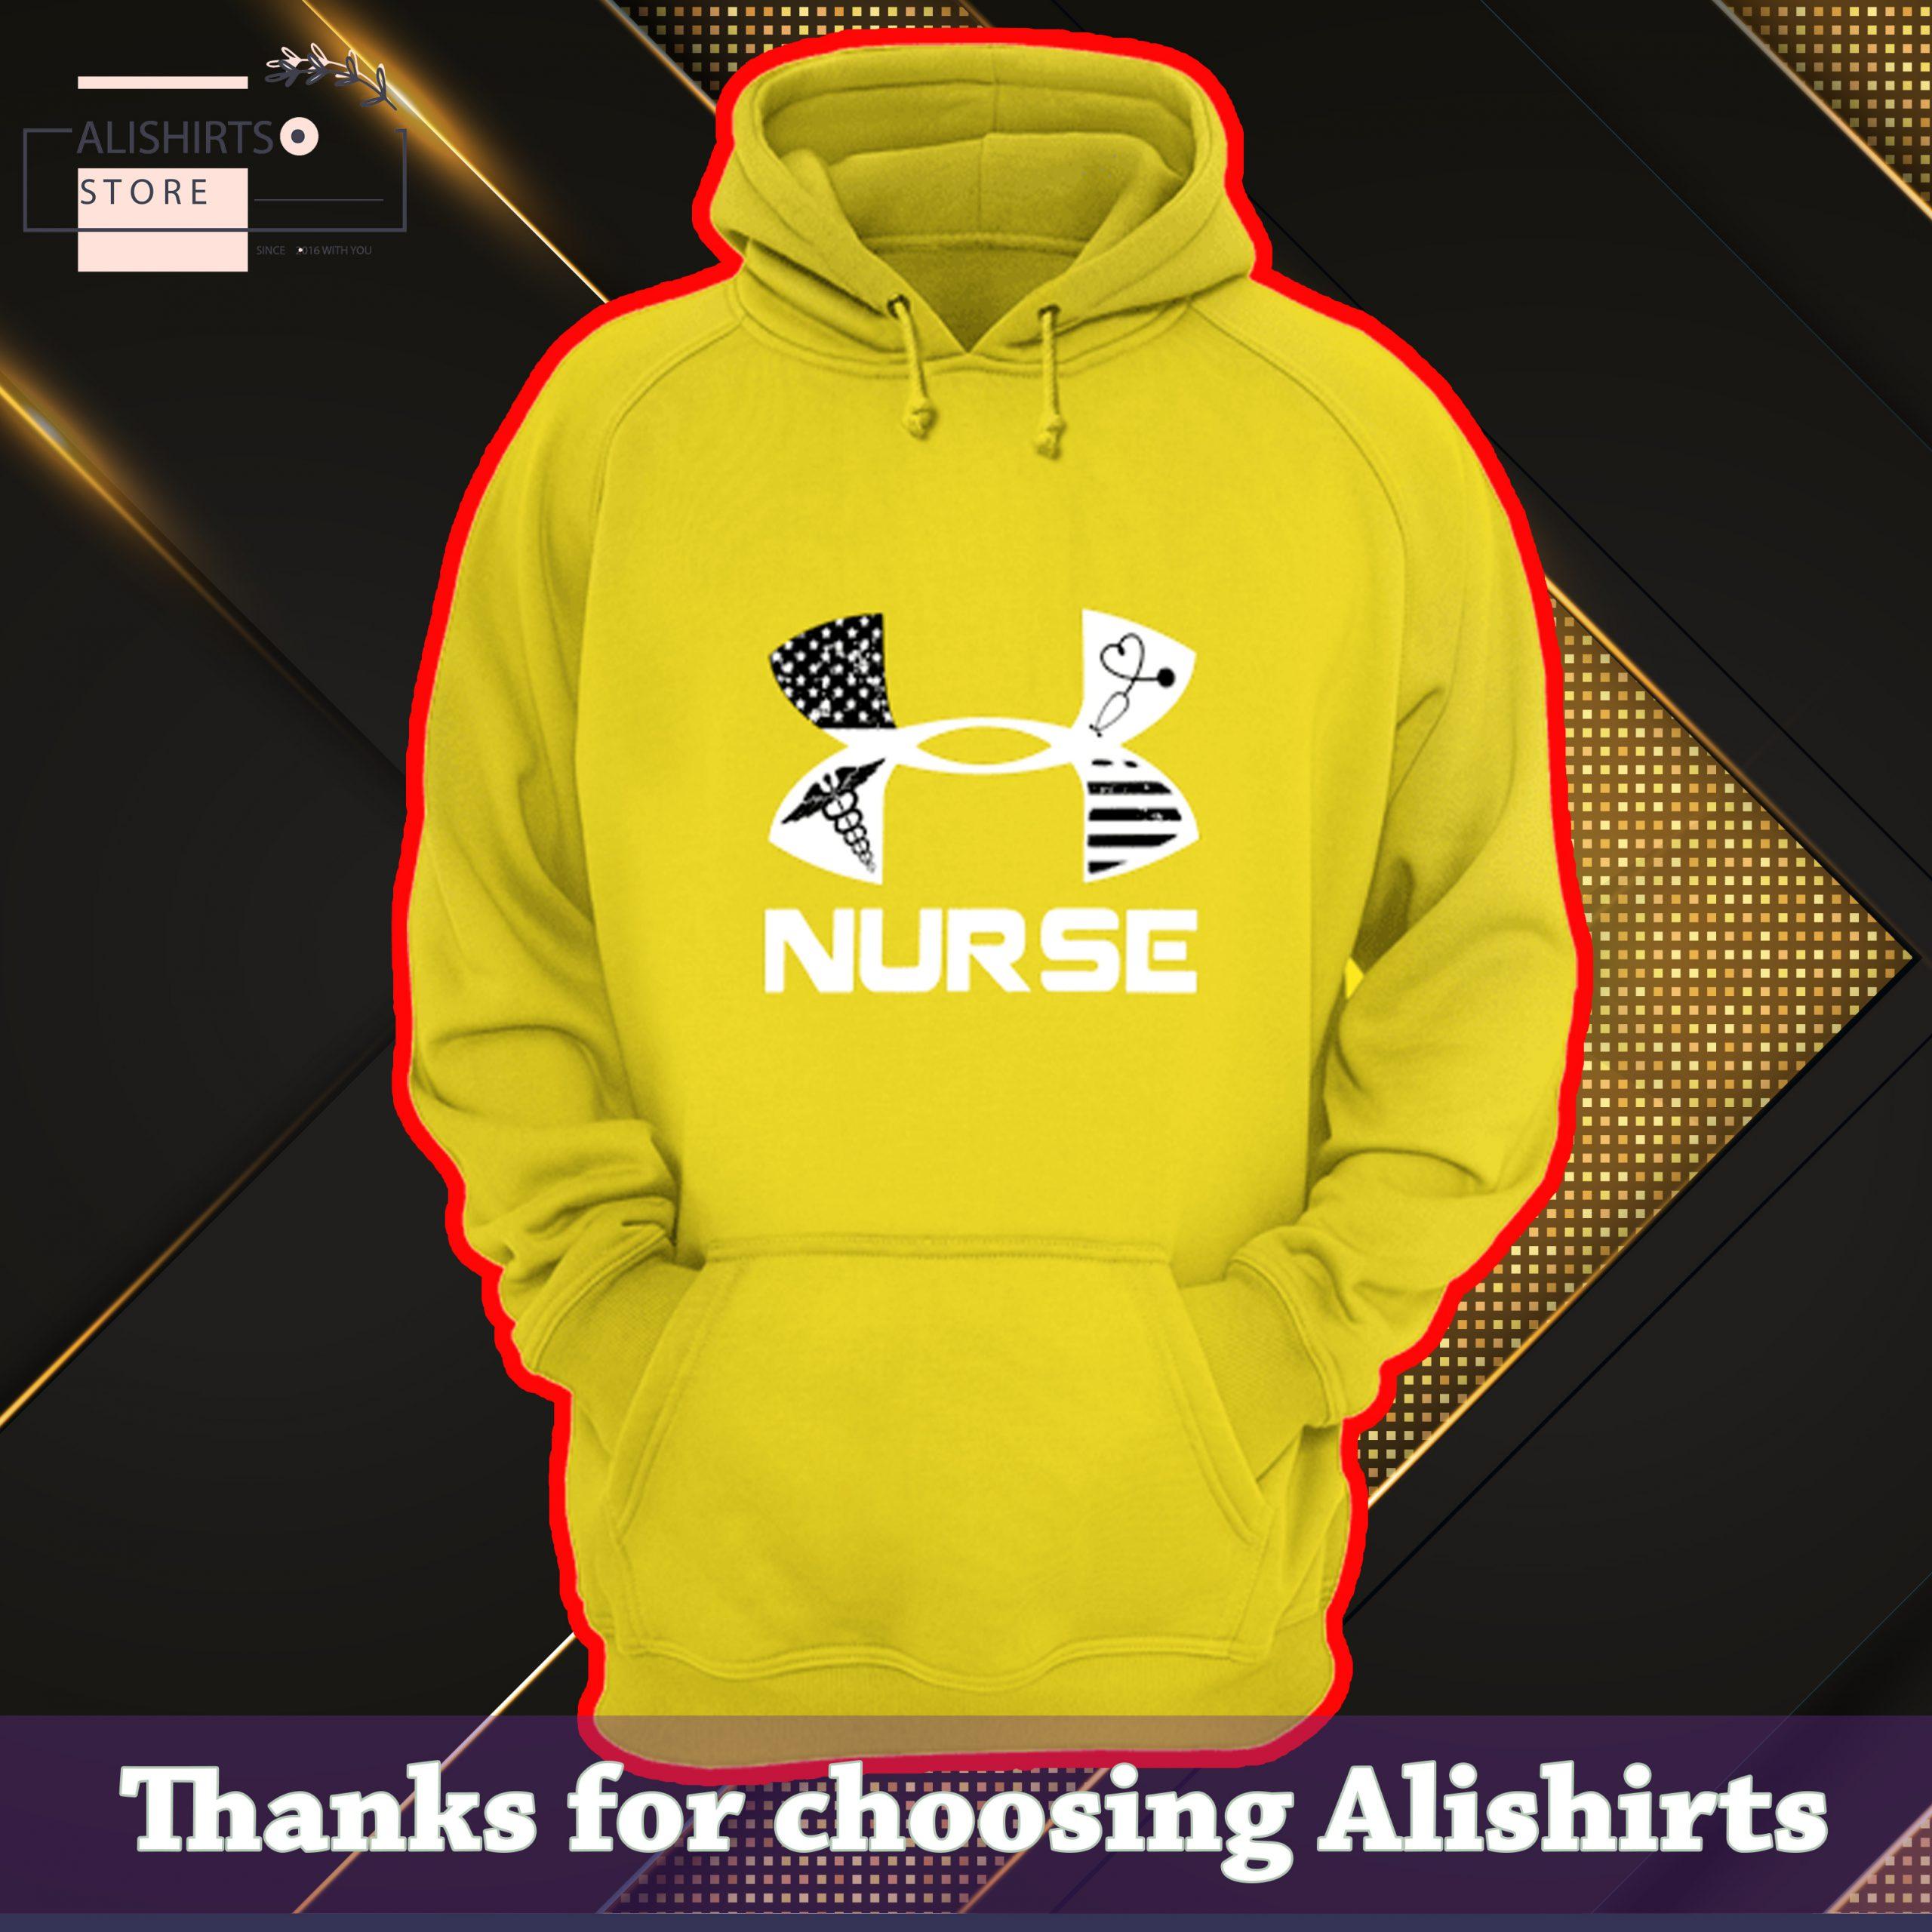 Nurse American Under Armour Shirt, Hoodie, Tank Top